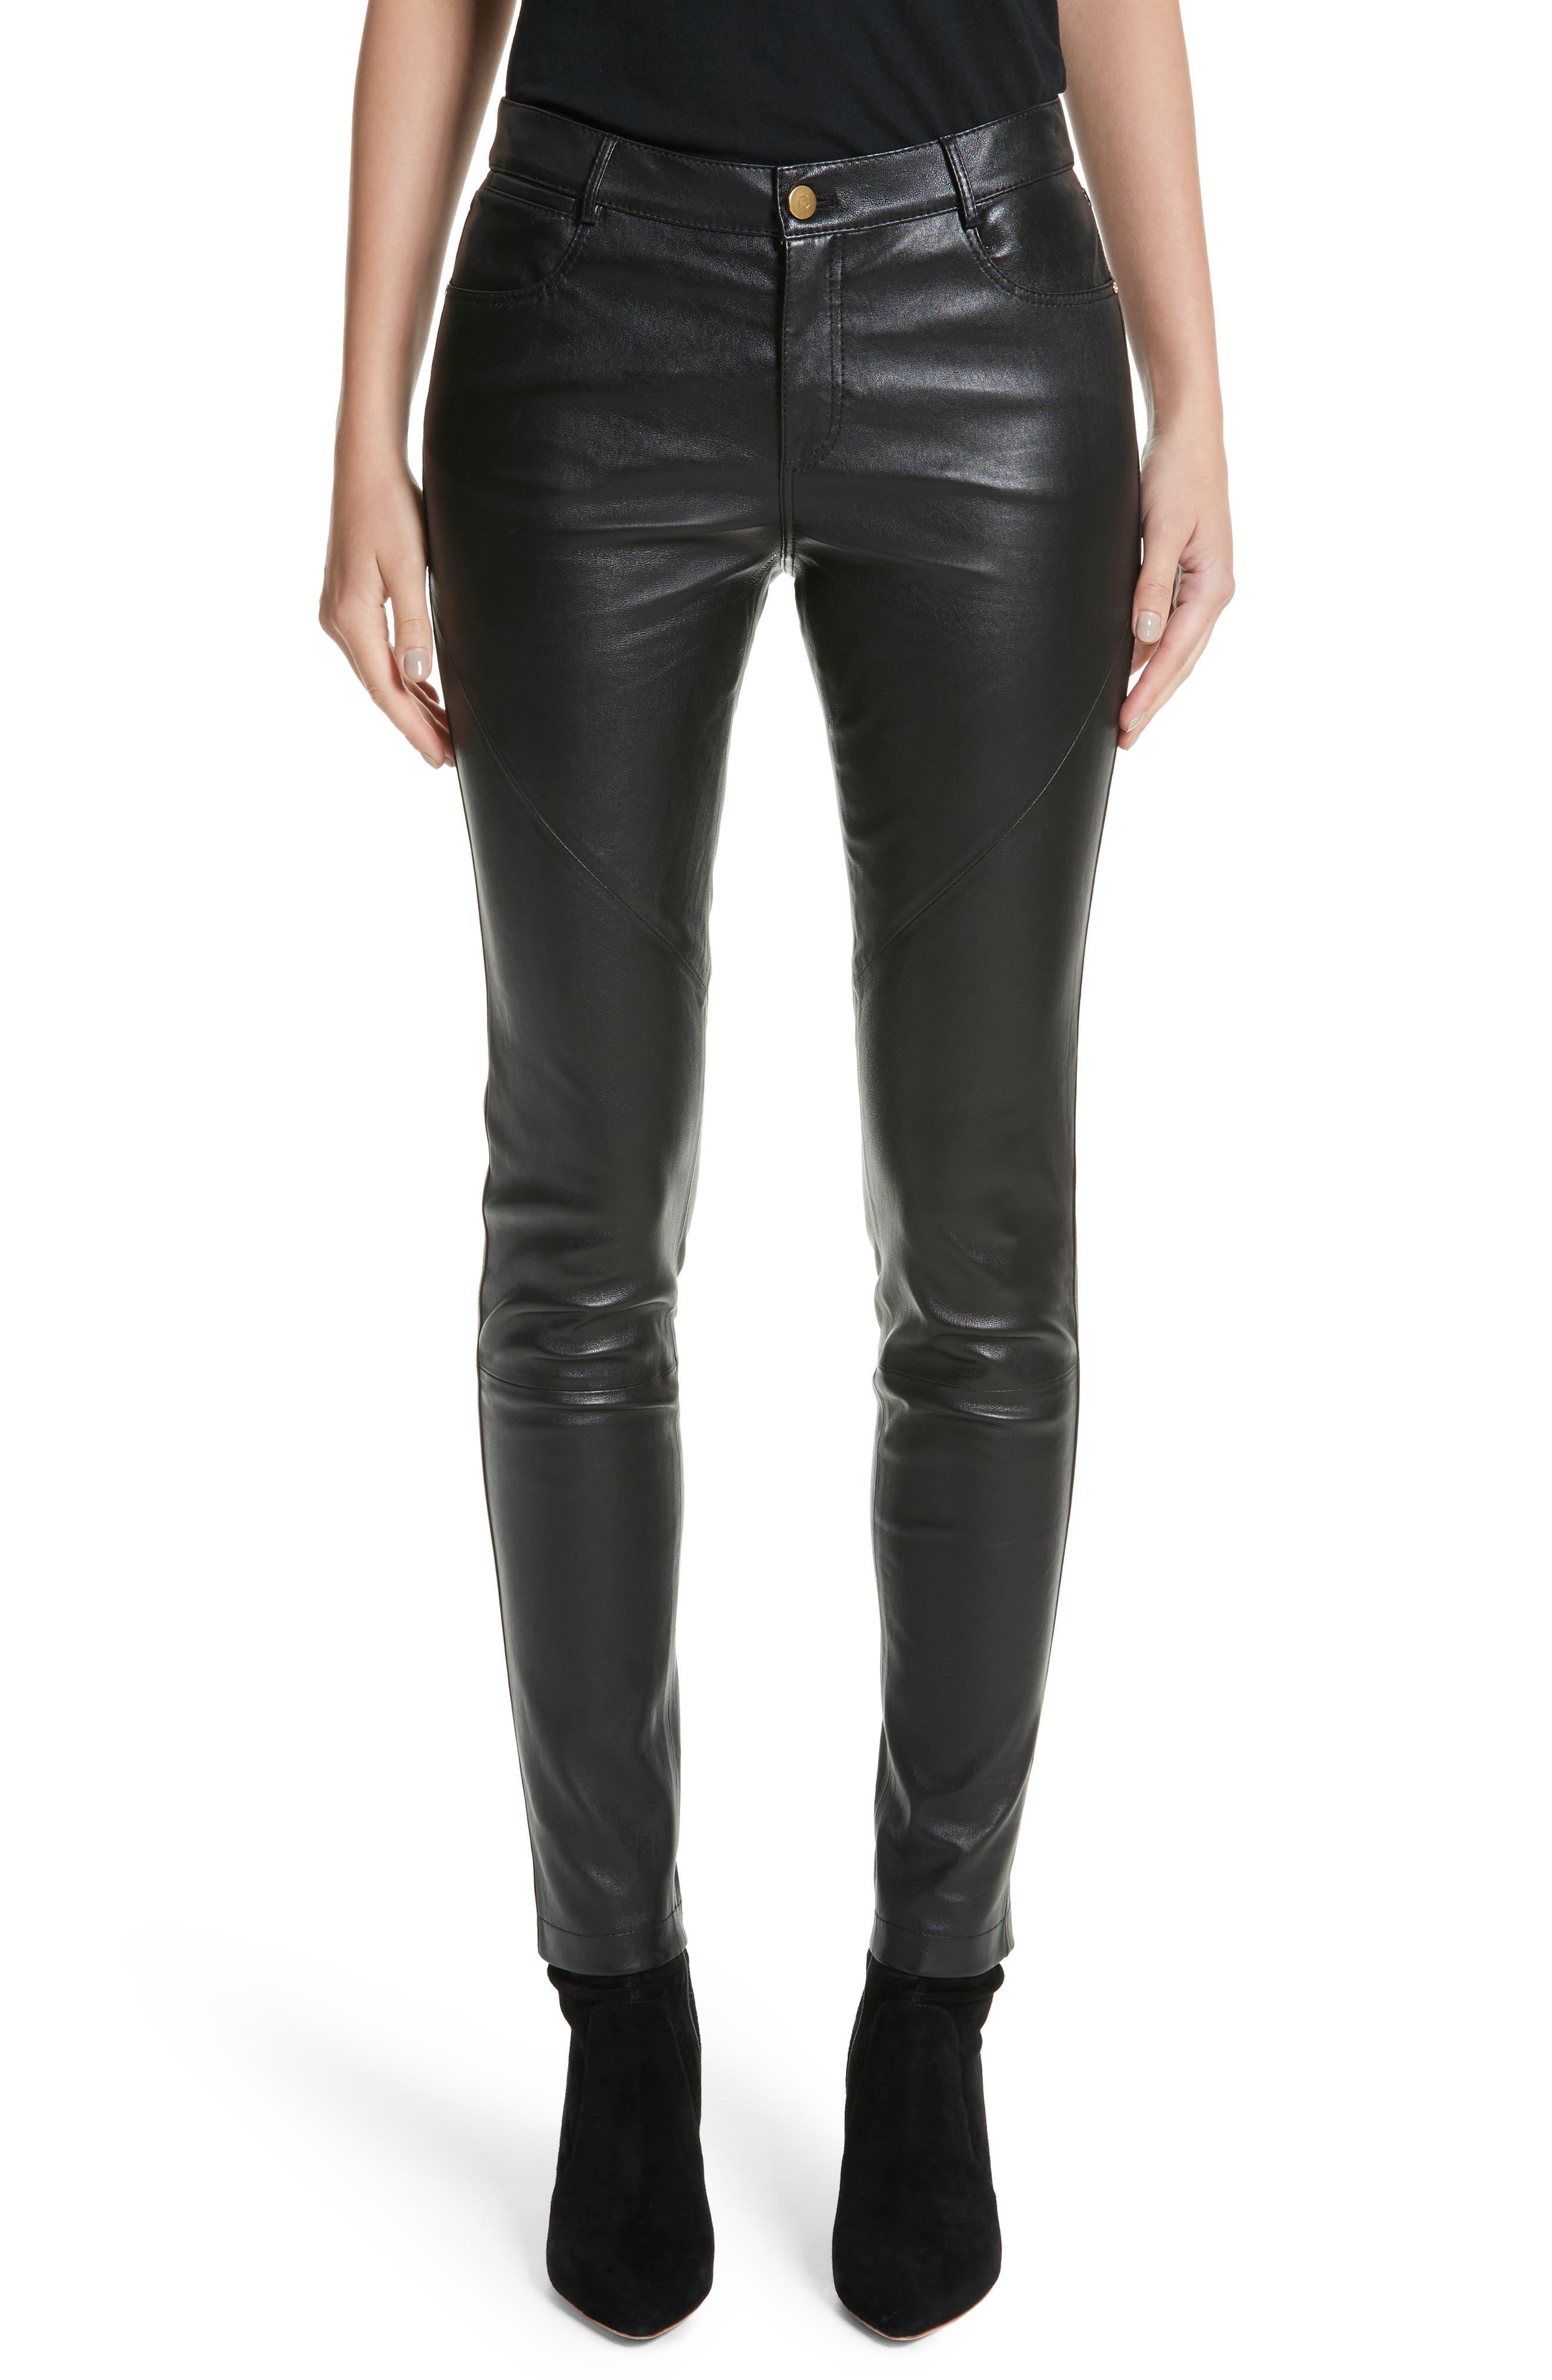 Alternate Image 1 Selected - Lafayette 148 New York Mercer Nappa Leather Pants